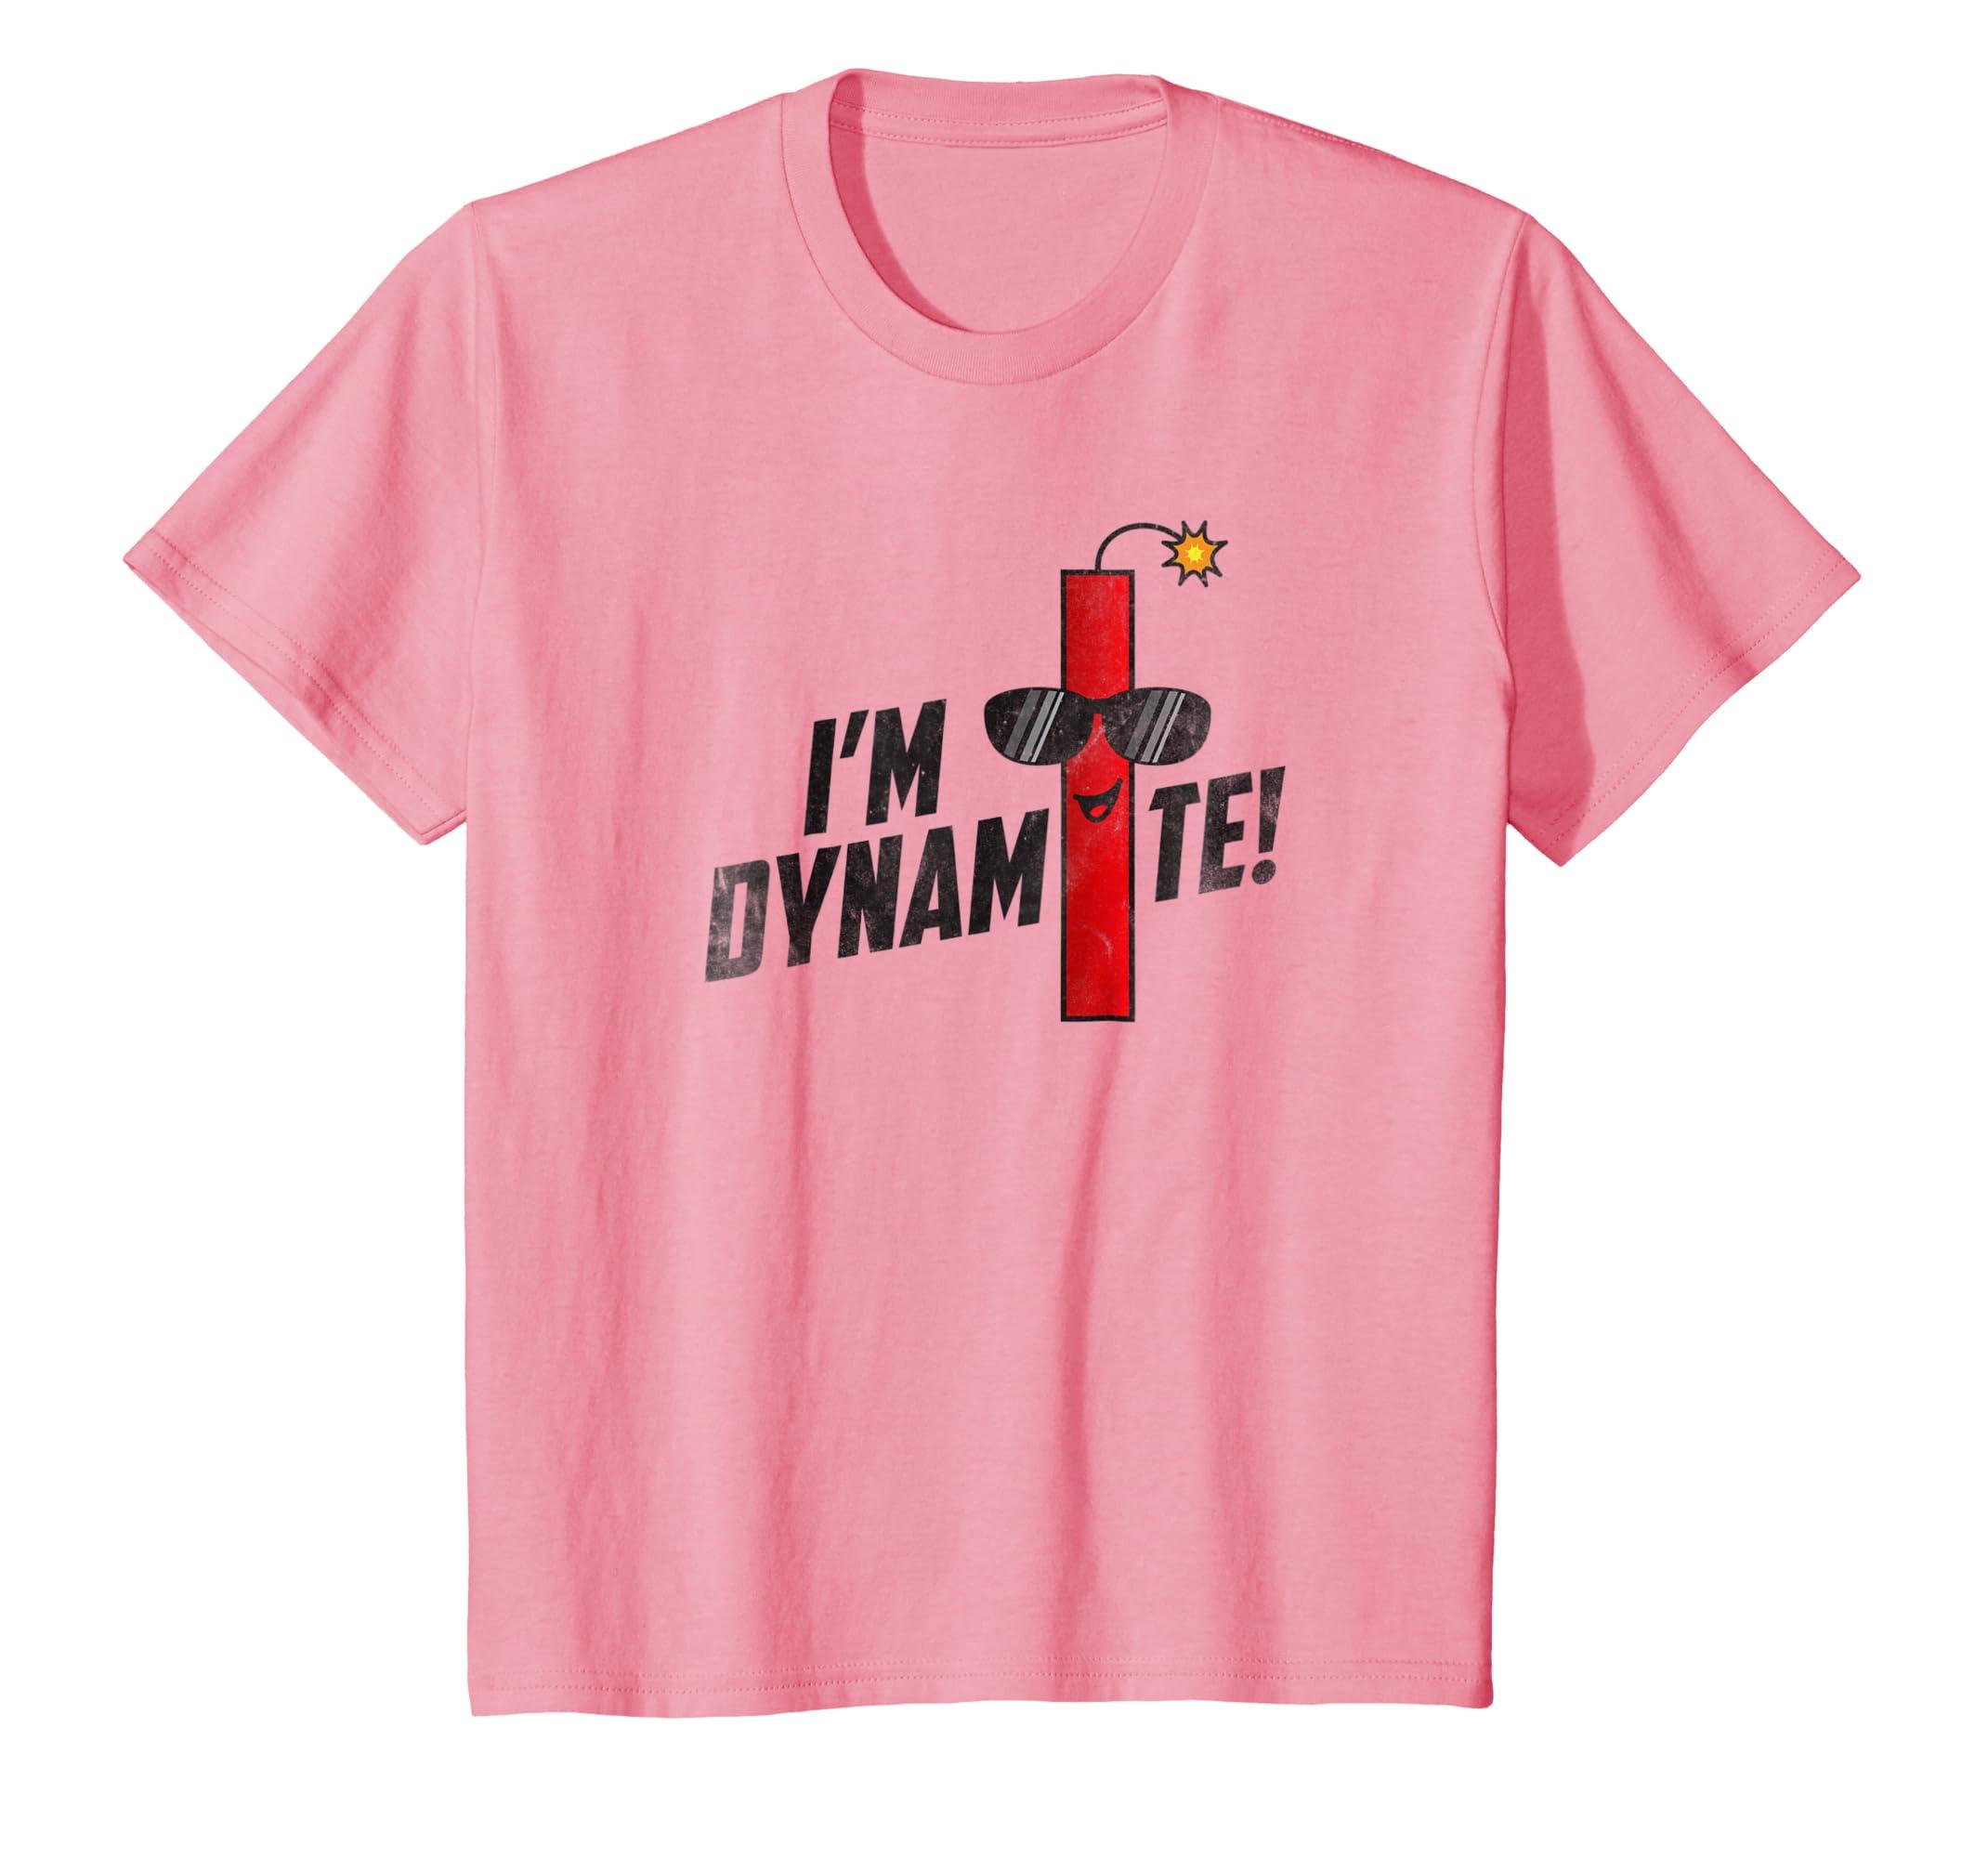 7c948aaca8e406 Amazon.com  Kids Funny I m Dynamite Shirt Cool Sunglasses TNT Tee  Clothing